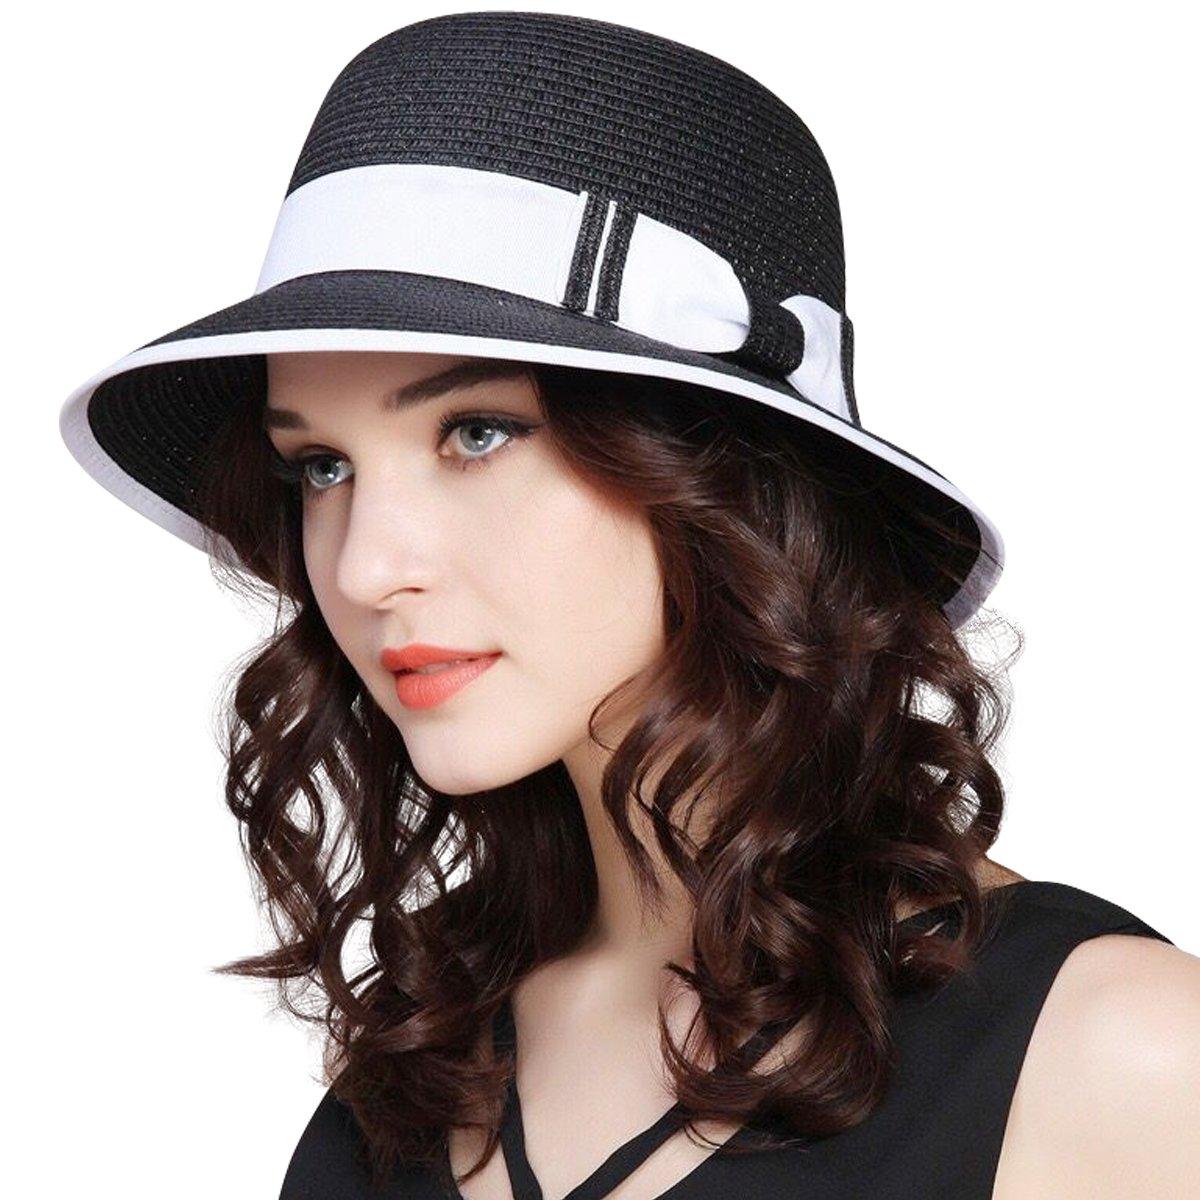 JOYEBUY Women Wide Brim Fedora Beach Sun Hat Straw Summer Packable Cap UPF50+ (A-Black)